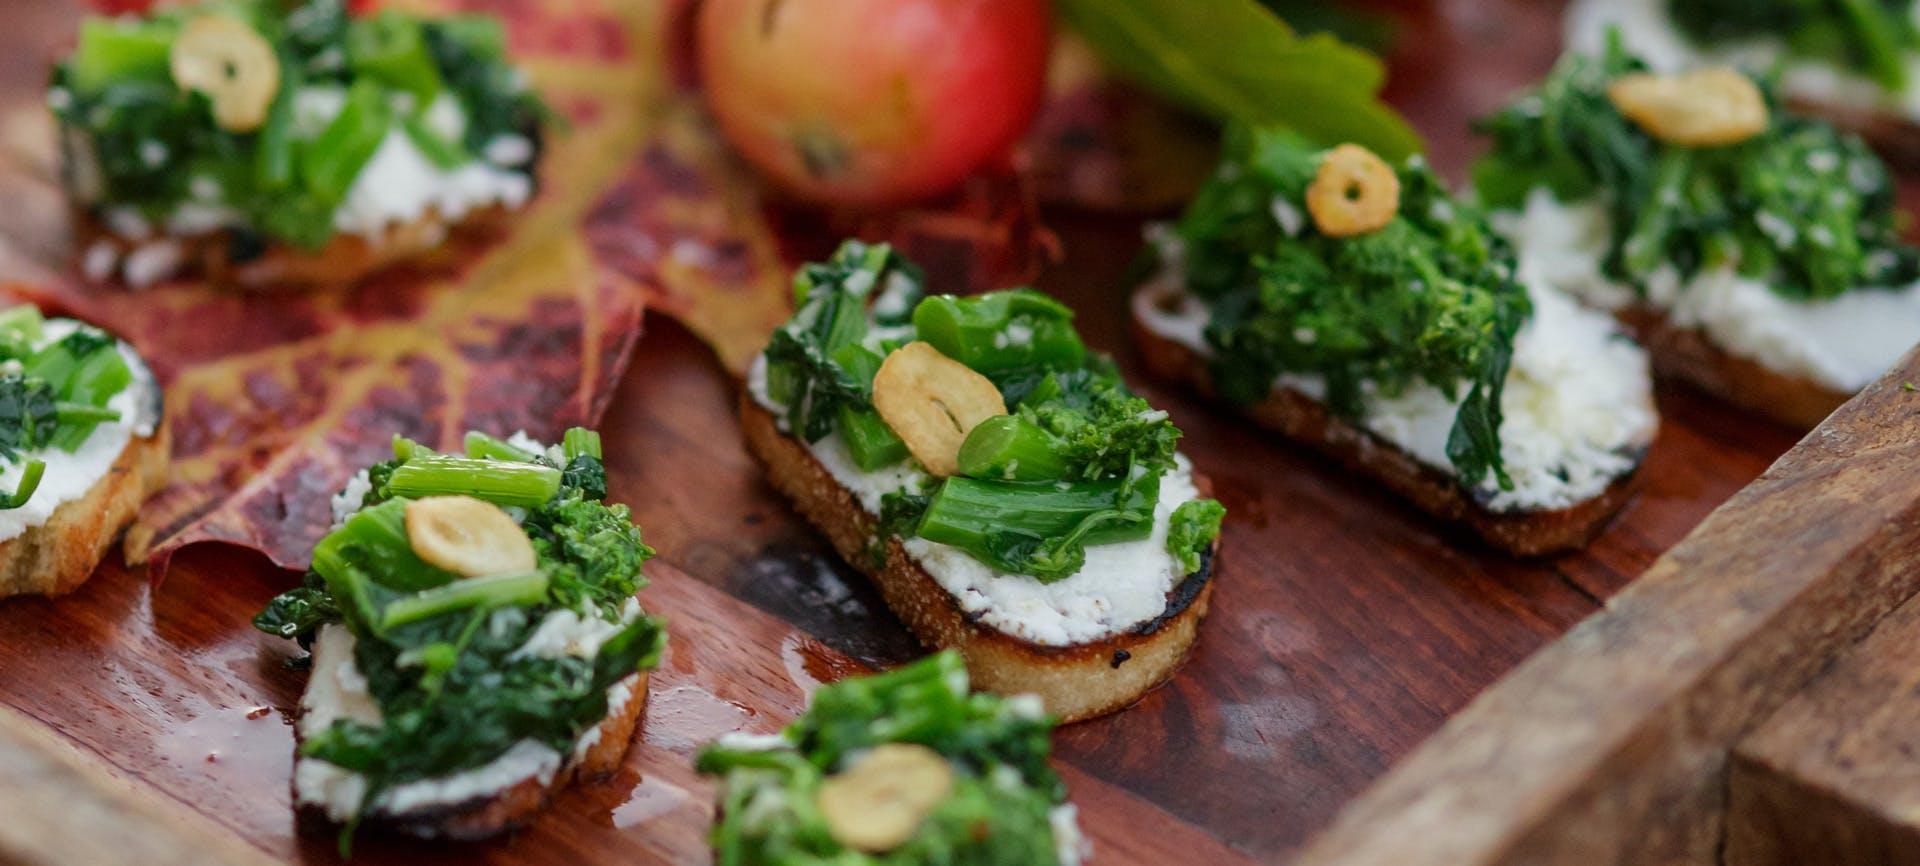 Broccoli Rabe & Goat Cheese Crostini